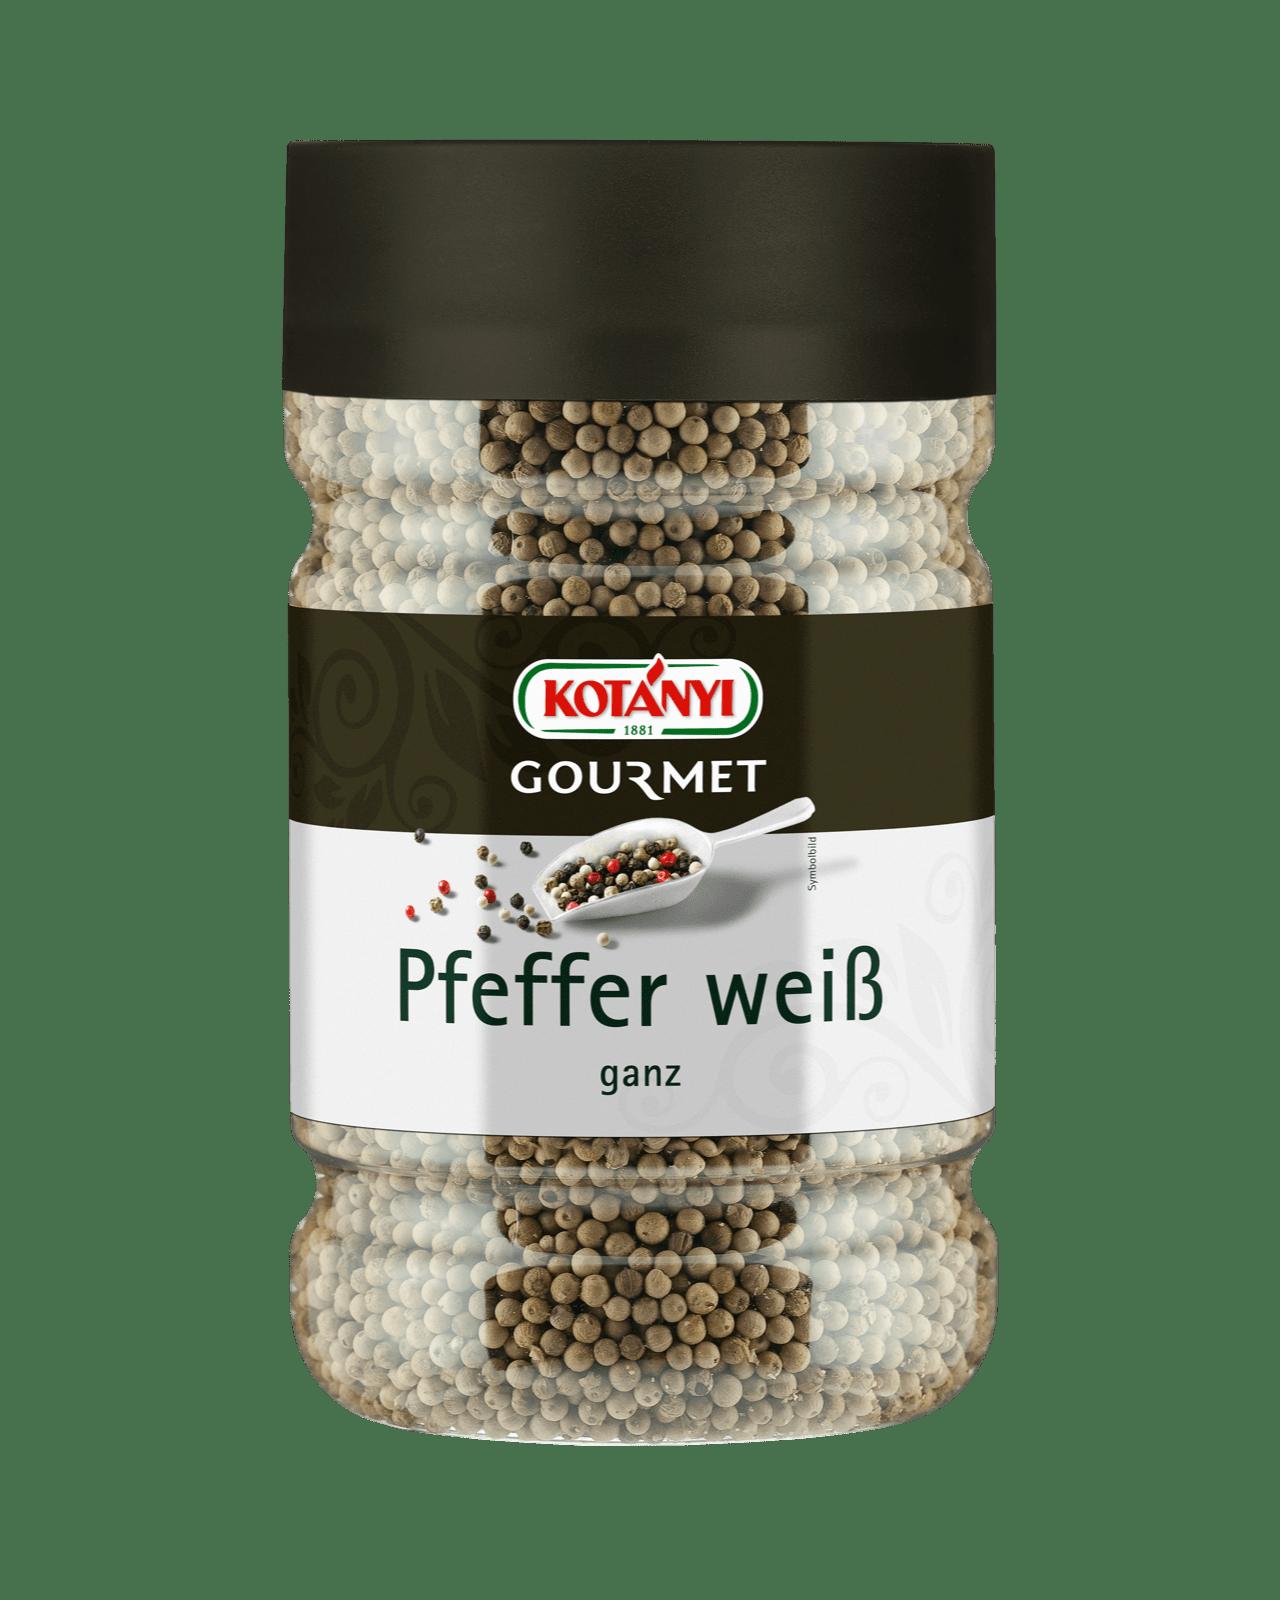 Kotányi Gourmet Pfeffer weiß ganz in der 1200ccm Dose